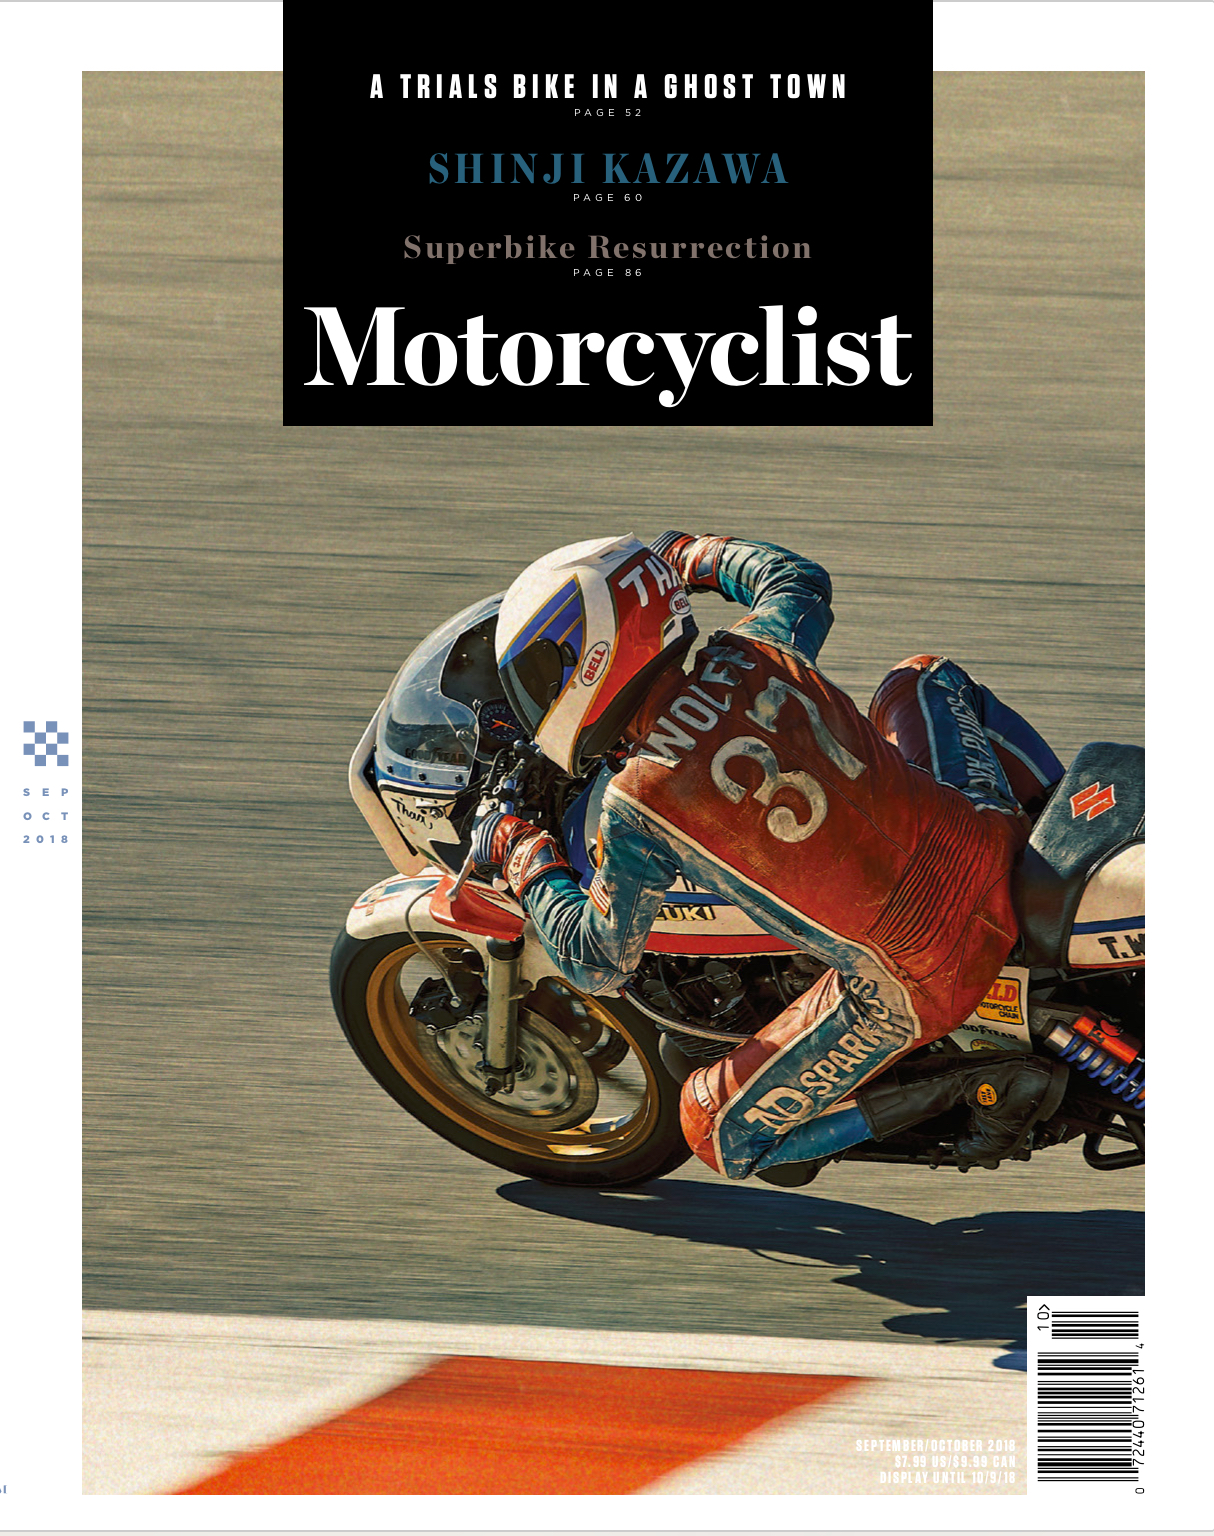 AMA Superbike Racer Thad Wolff | Motorcyclist Magazine